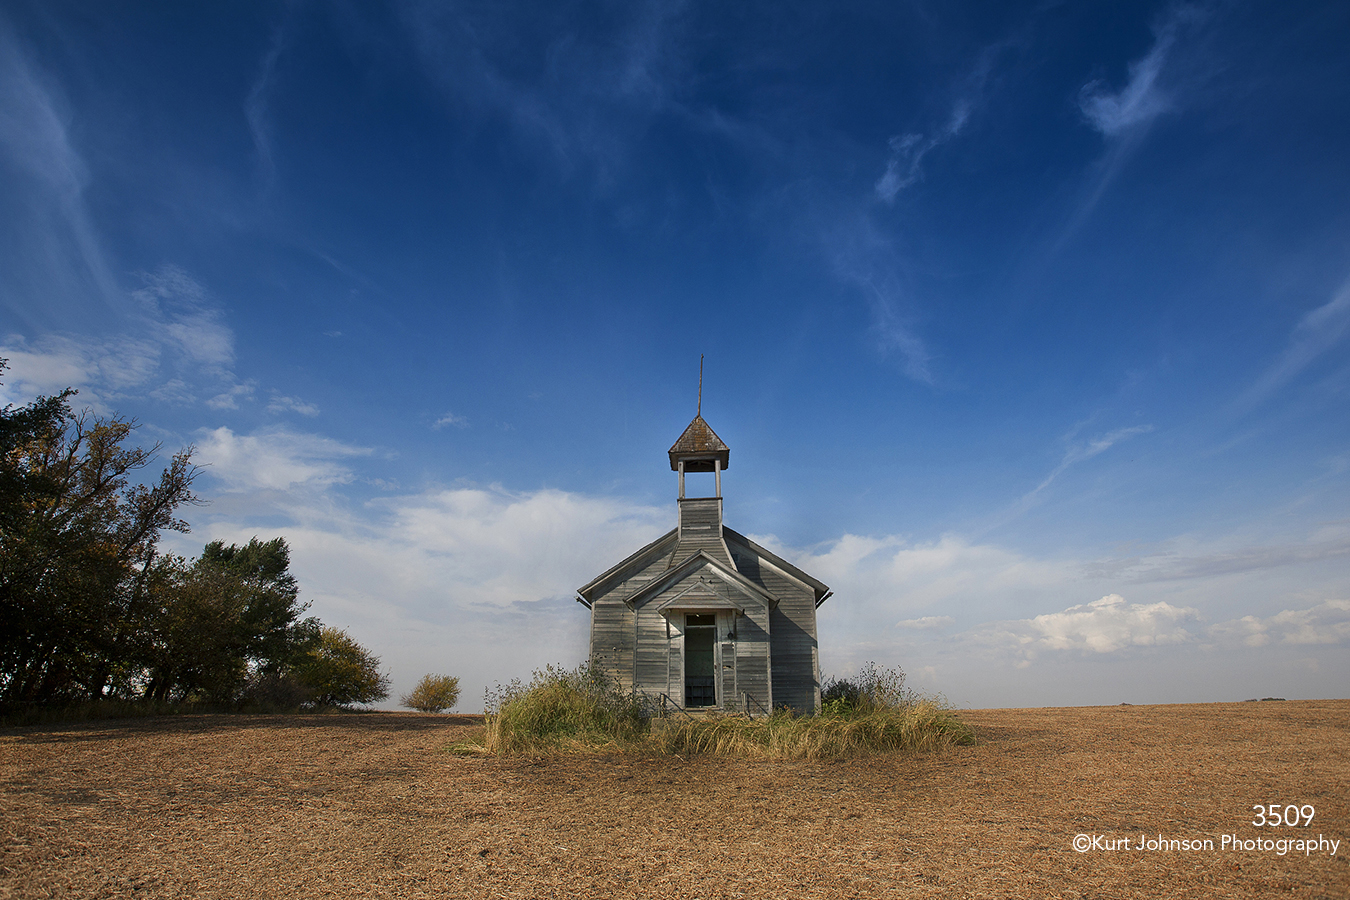 landscape midwest school house blue sky